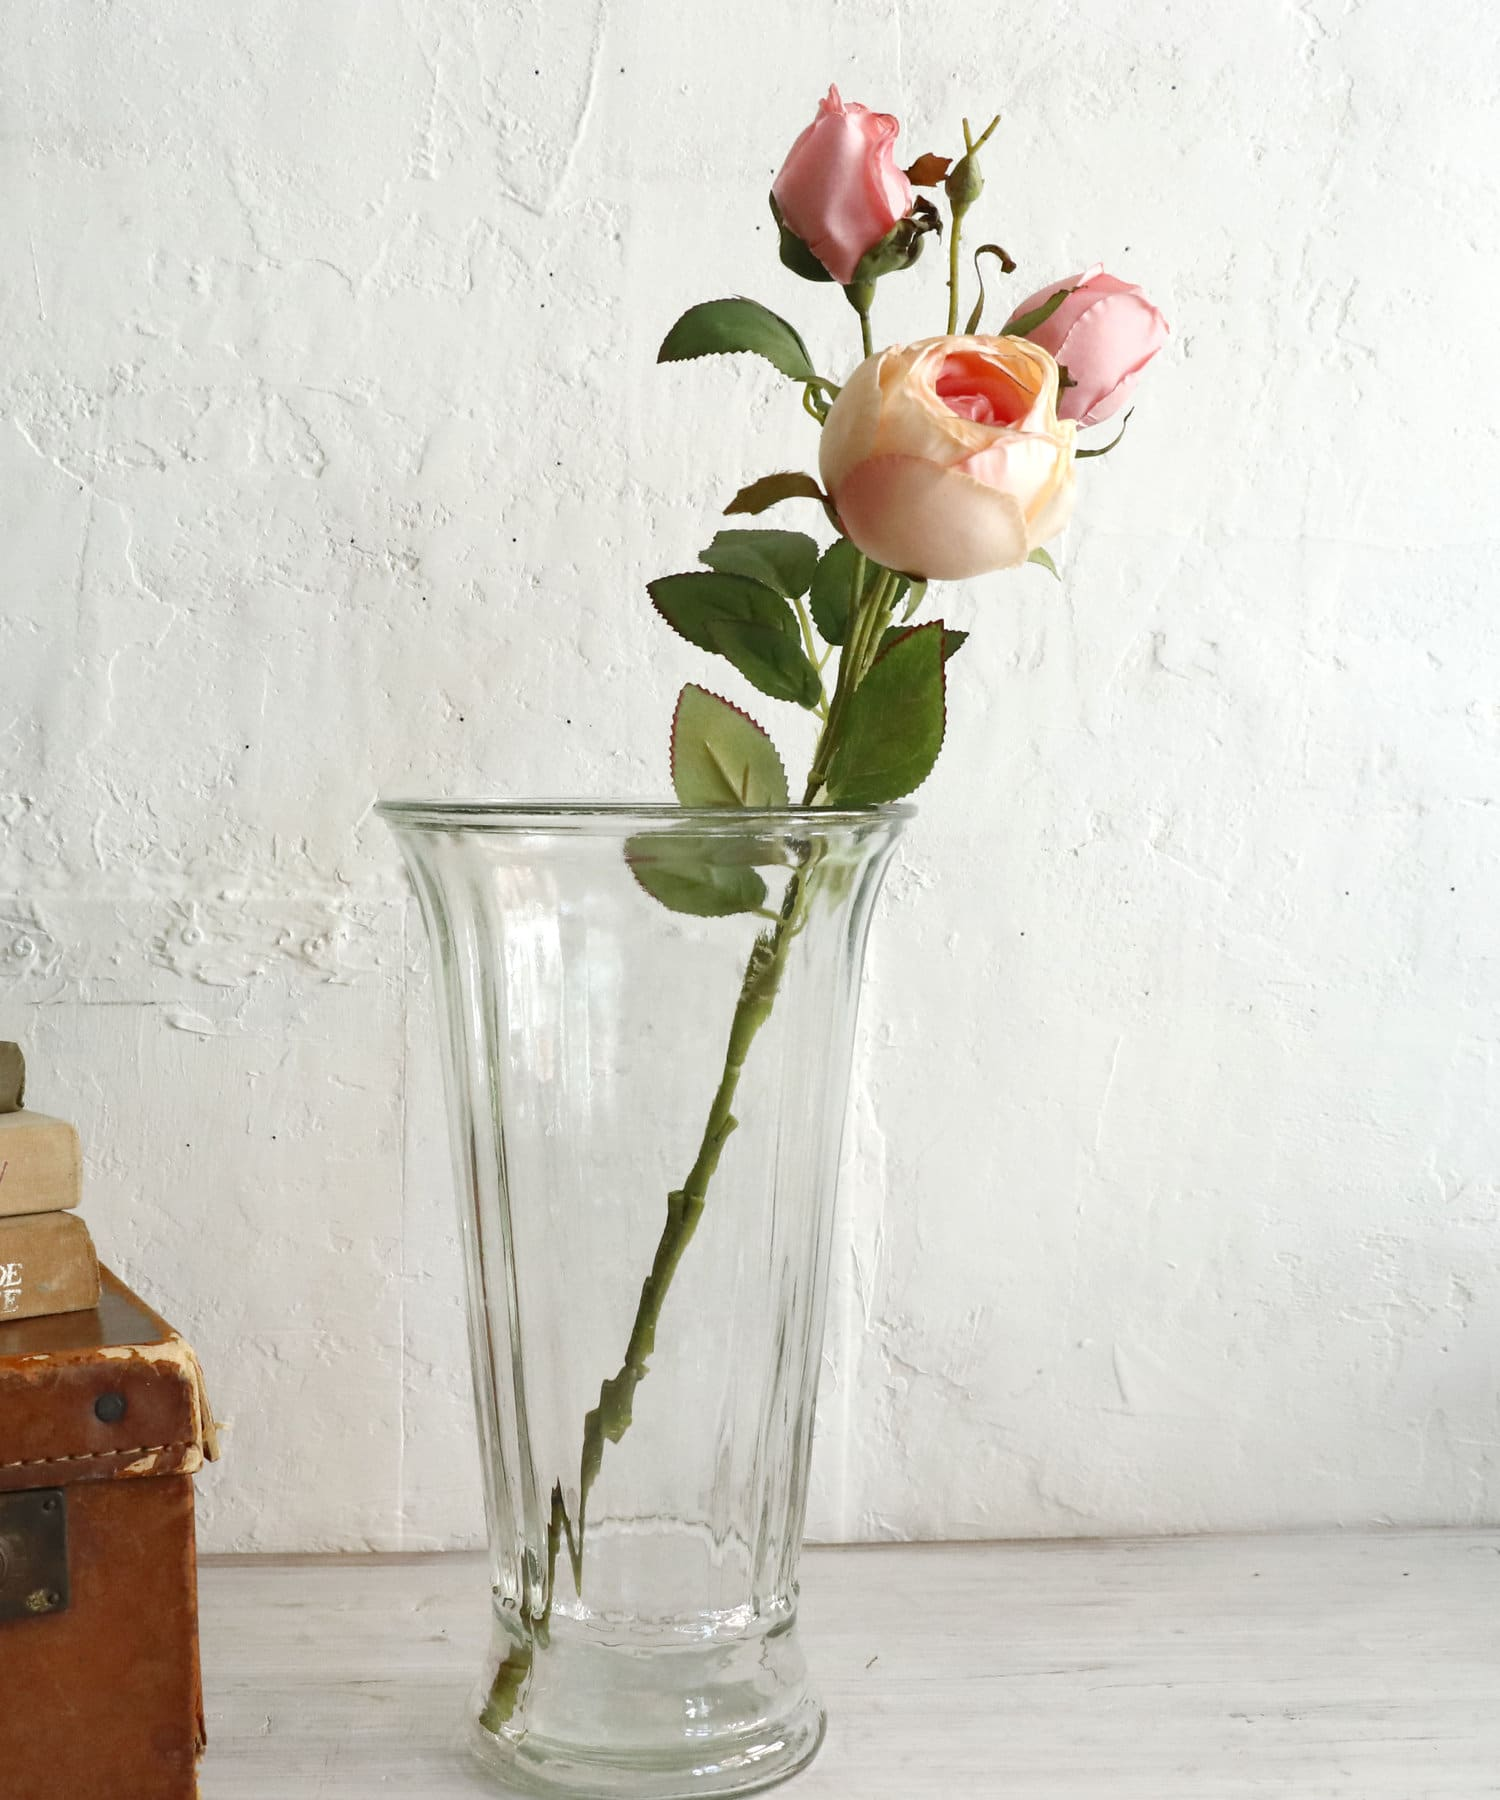 salut!(サリュ) ライフスタイル 【Welcome Decoration】フェイクローズ(ピンク) ピンク